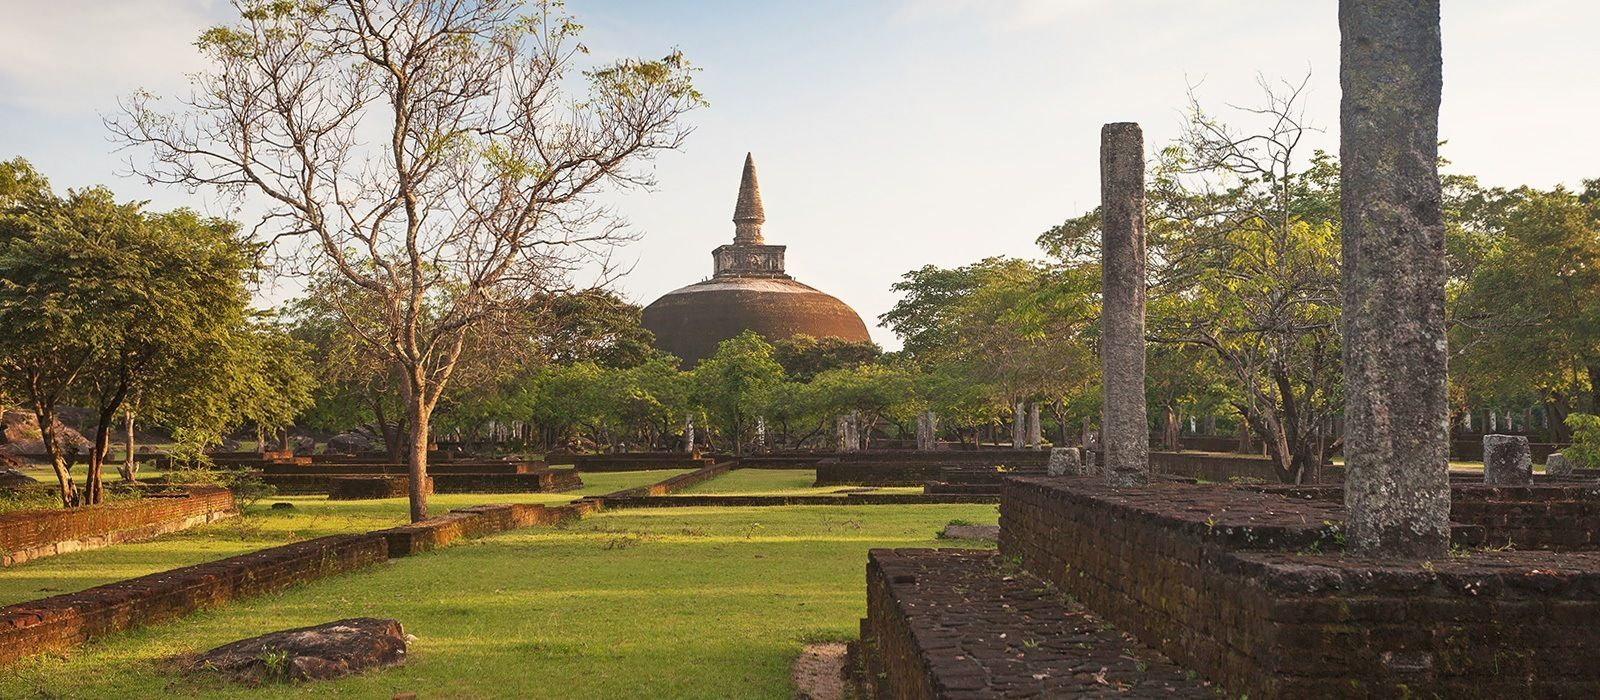 Reise nach Sri Lanka: Traumland & Ayurveda Paradies Urlaub 3